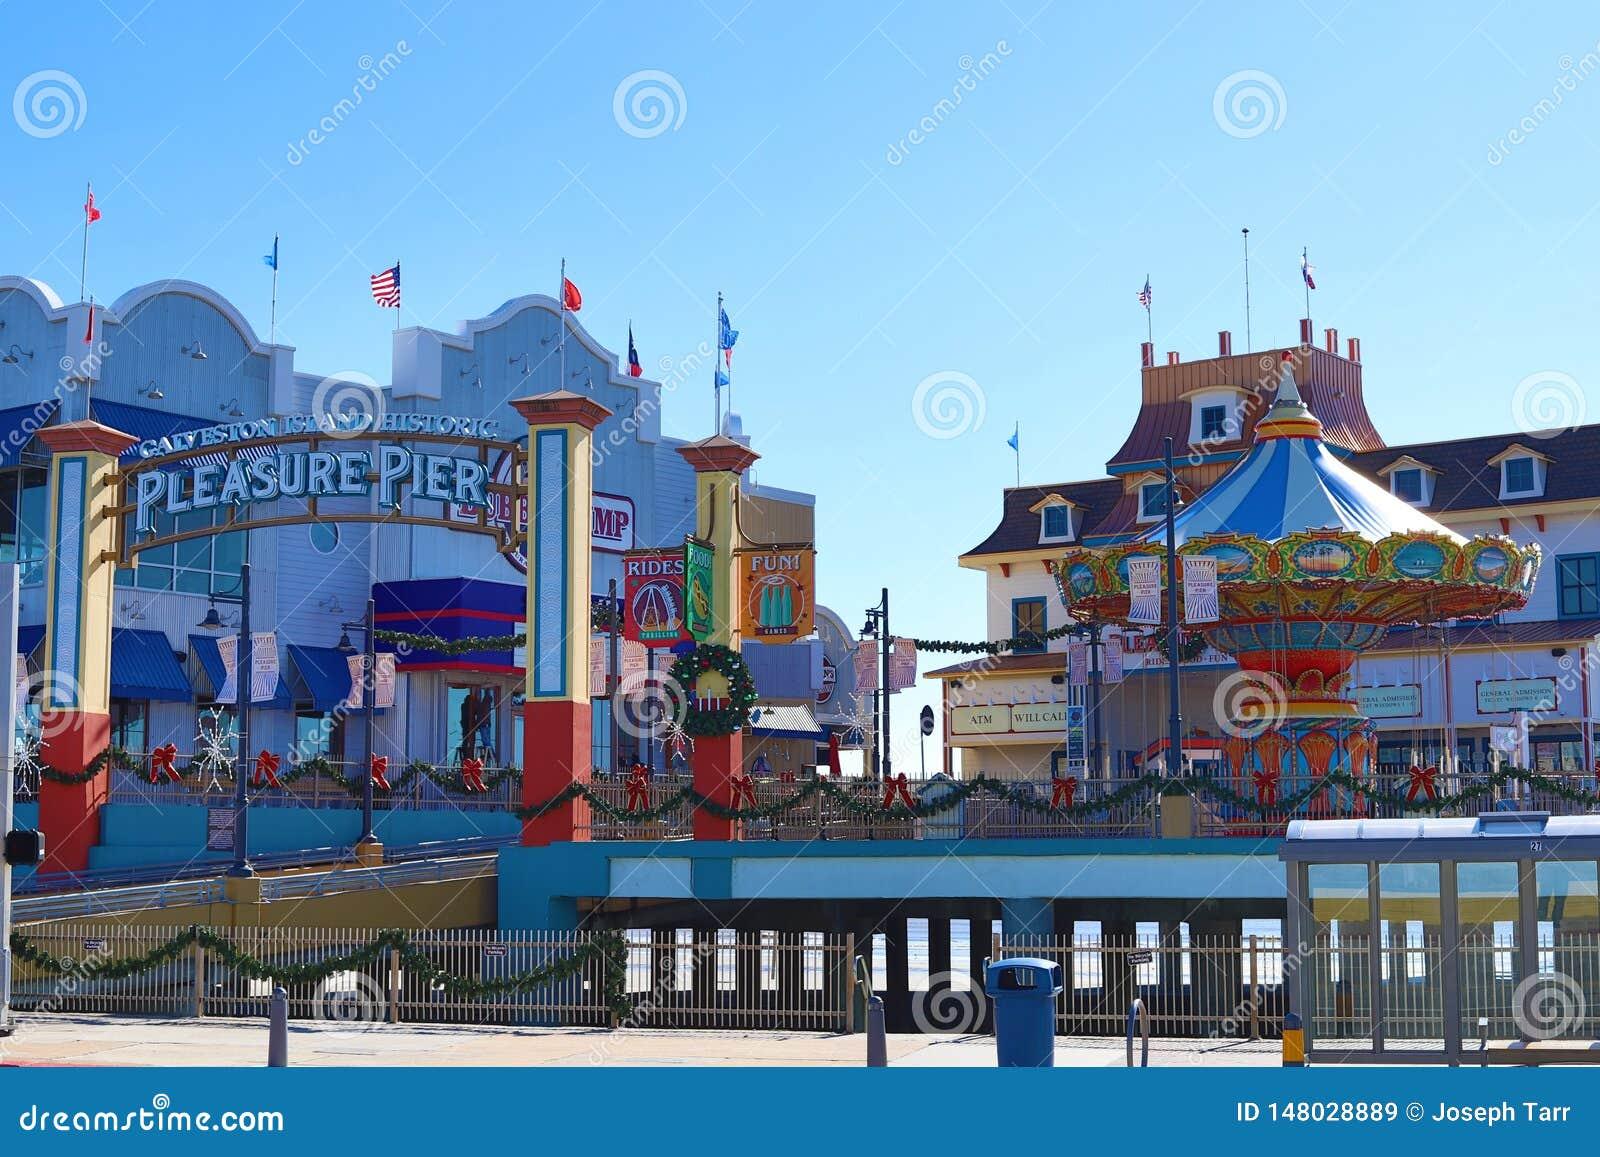 Galveston Island Historic Pleasure Pier decorated for Christmas.